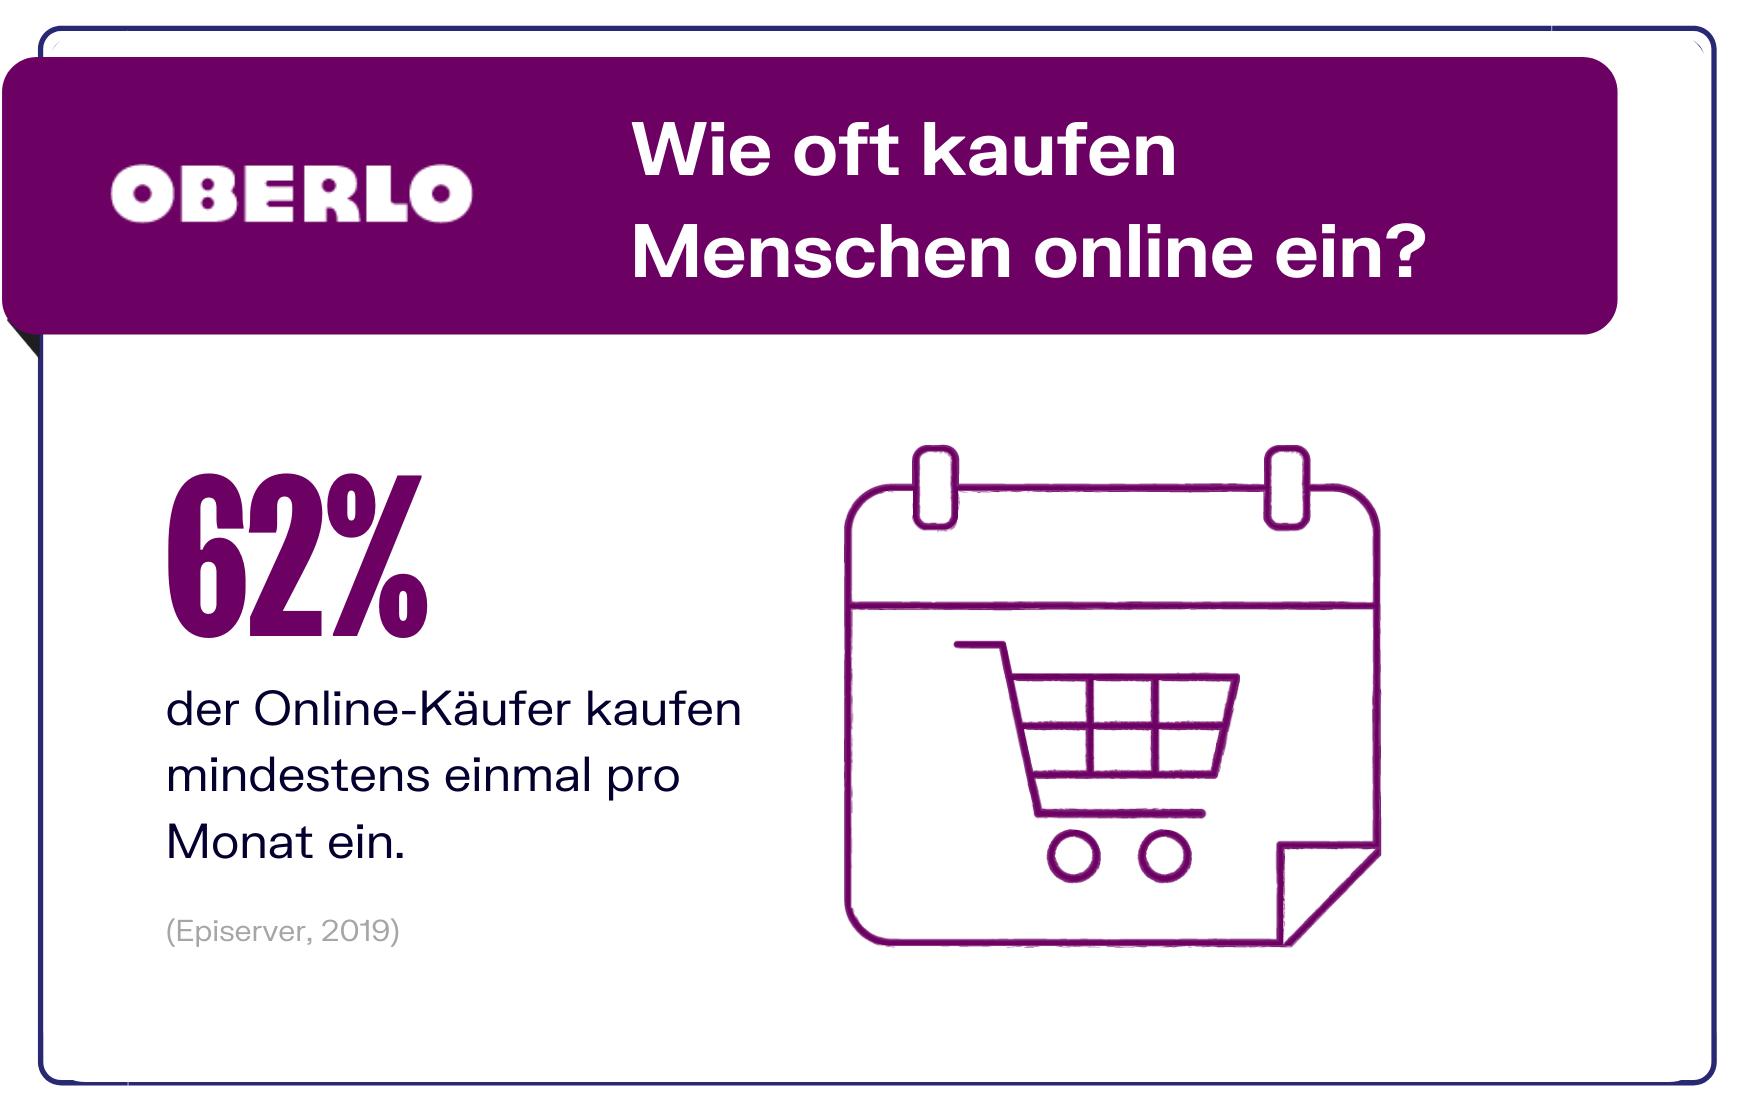 Online Shopping Statistik - Frequenz